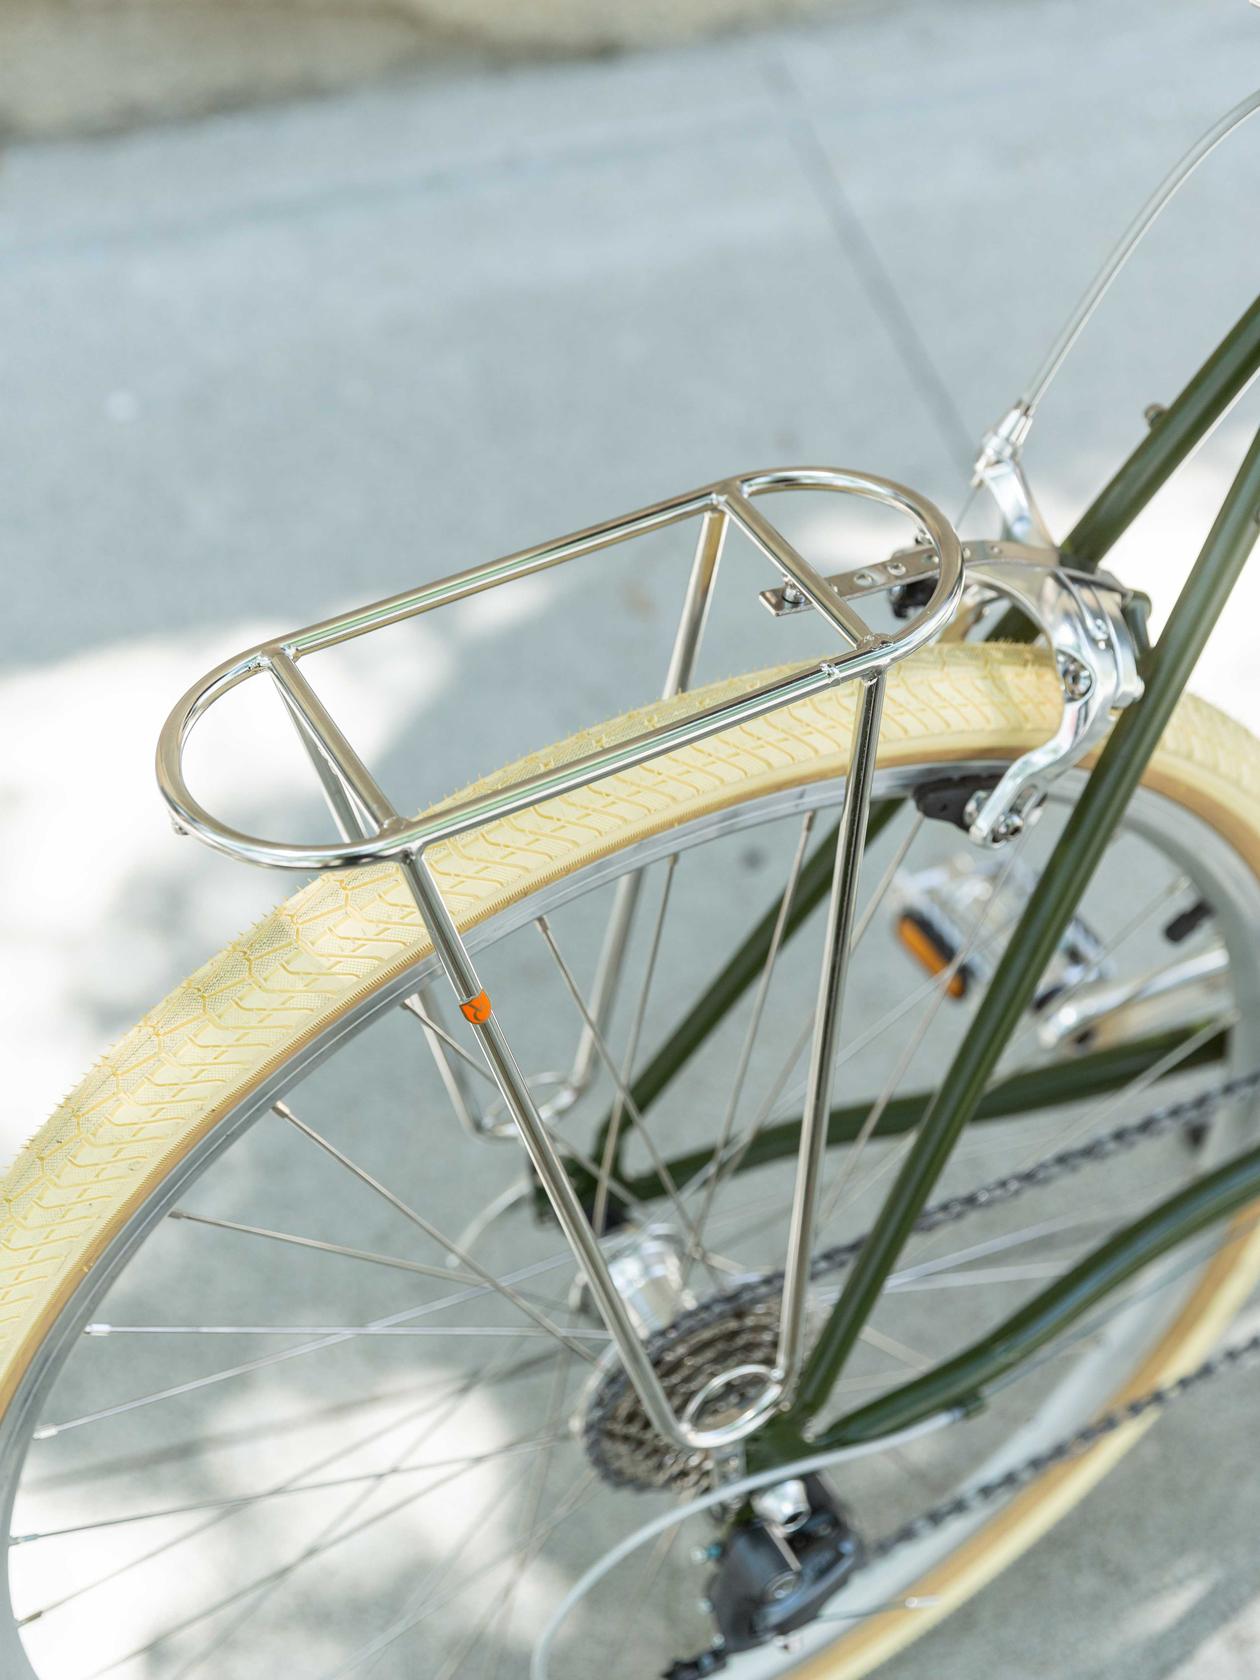 Constructeur Rear Rack, Silver